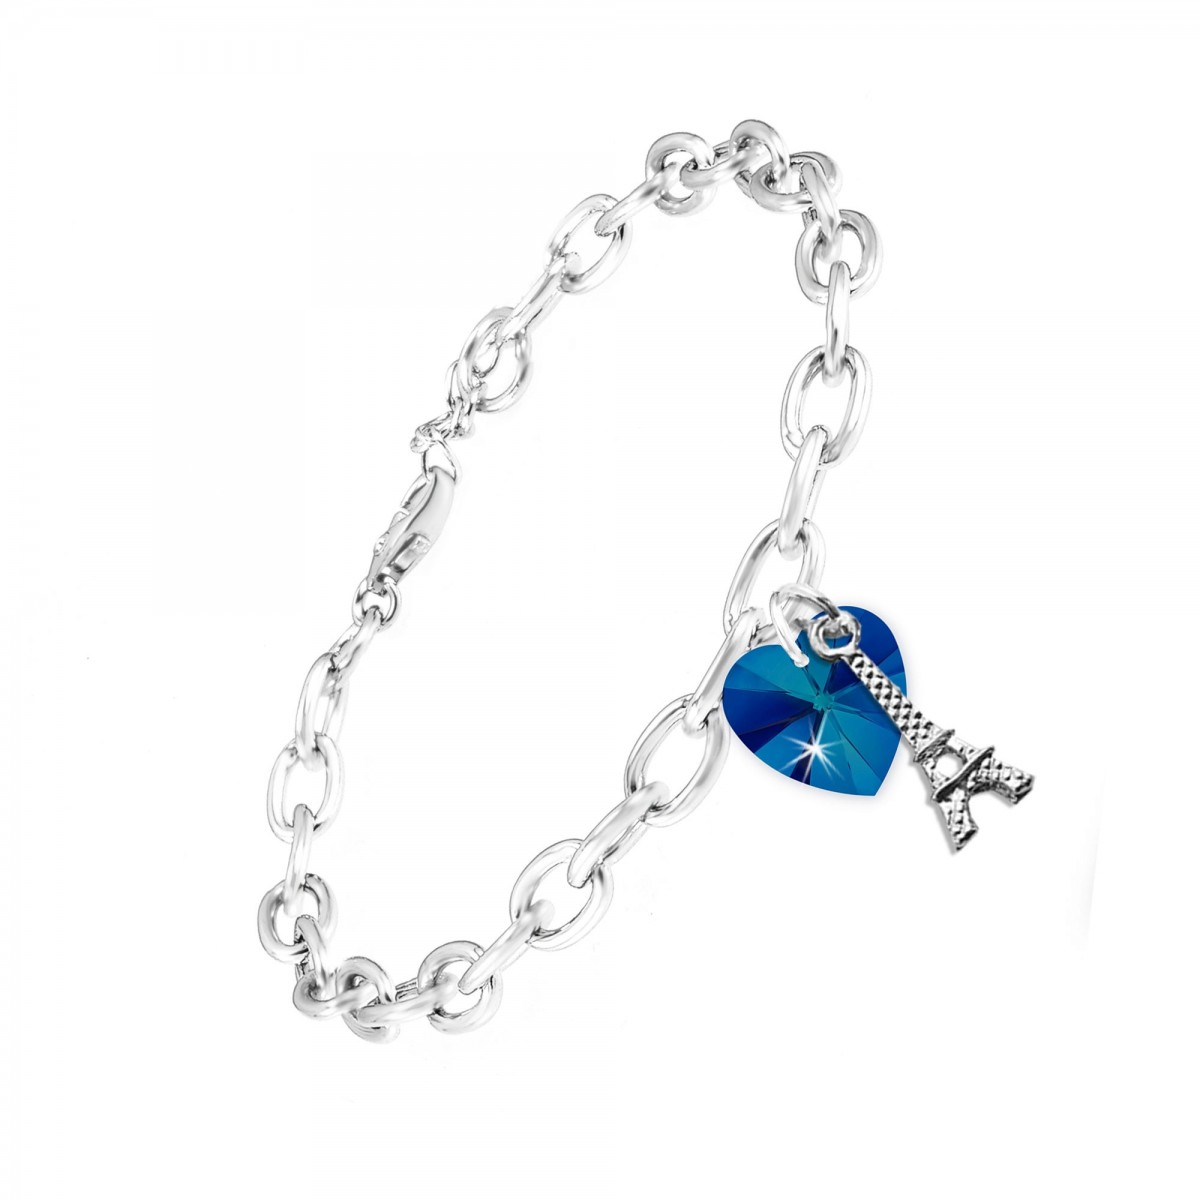 BS050-SB001-BEBL Bracelet argenté Tour Eiffel So Charm orné d'un coeur made with crystals from Swarovski bermuda blue